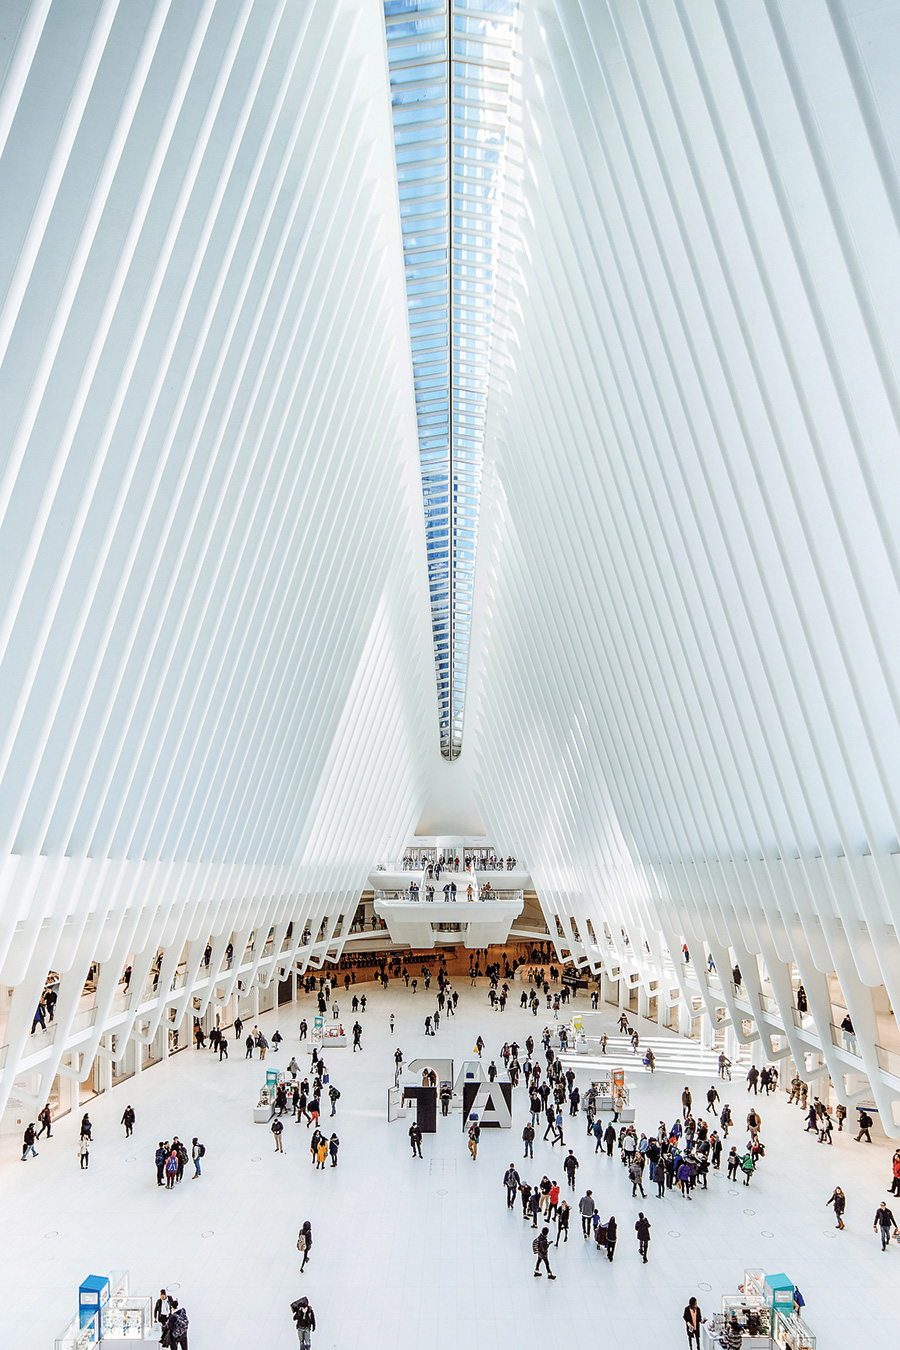 NYCxDesign 2019 Design Destinations